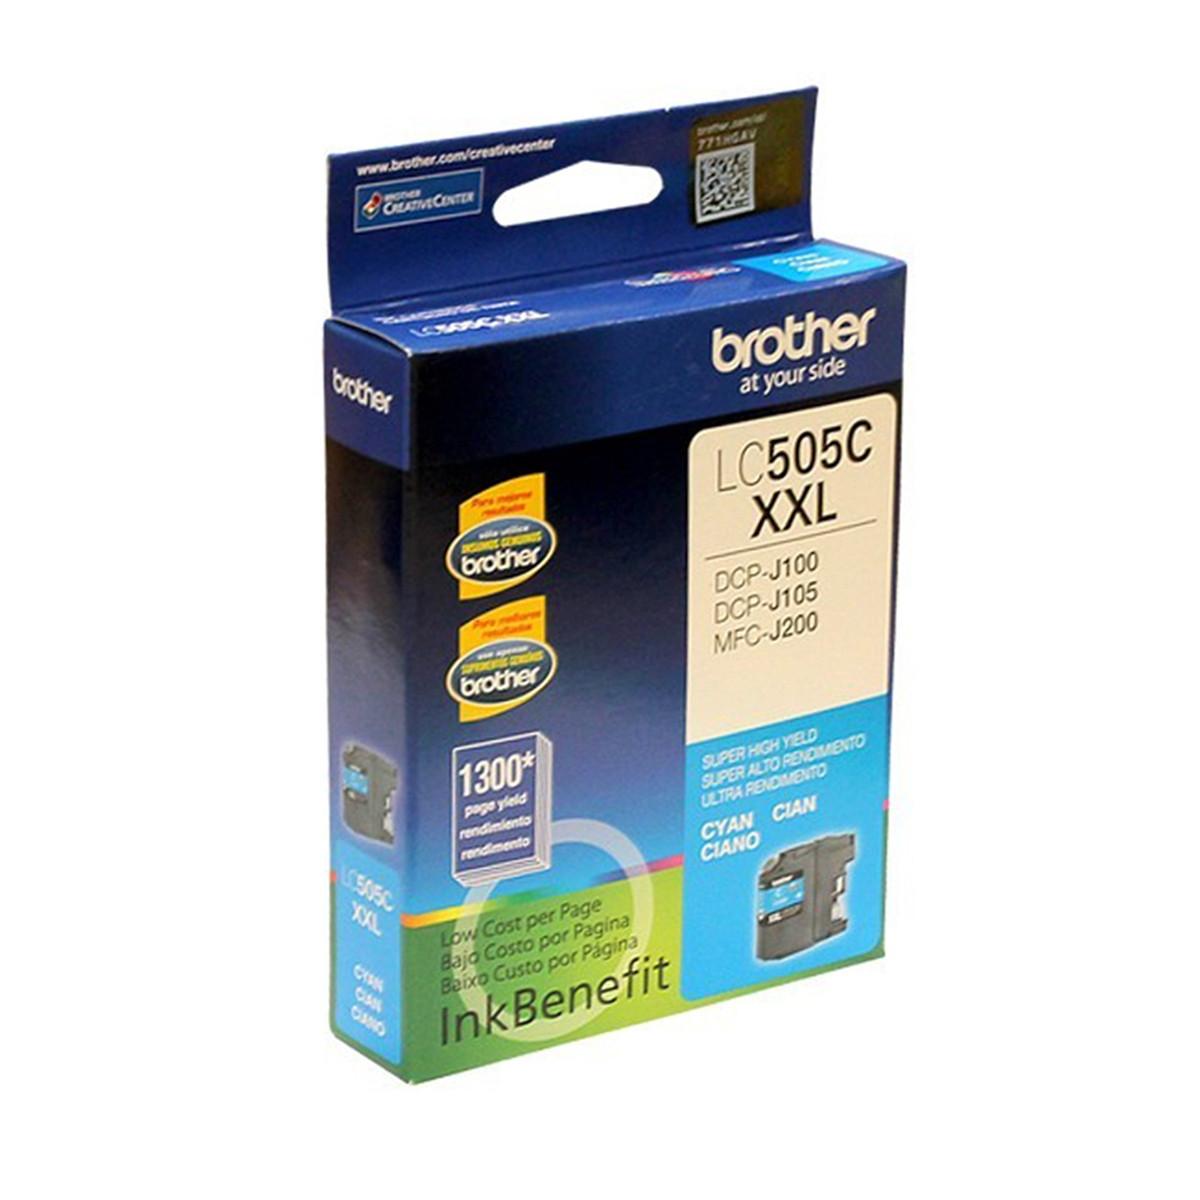 Cartucho de Tinta Brother LC-505C LC505 Ciano | MFC-J200 DCP-J105 DCP-J100 | Original 12ml